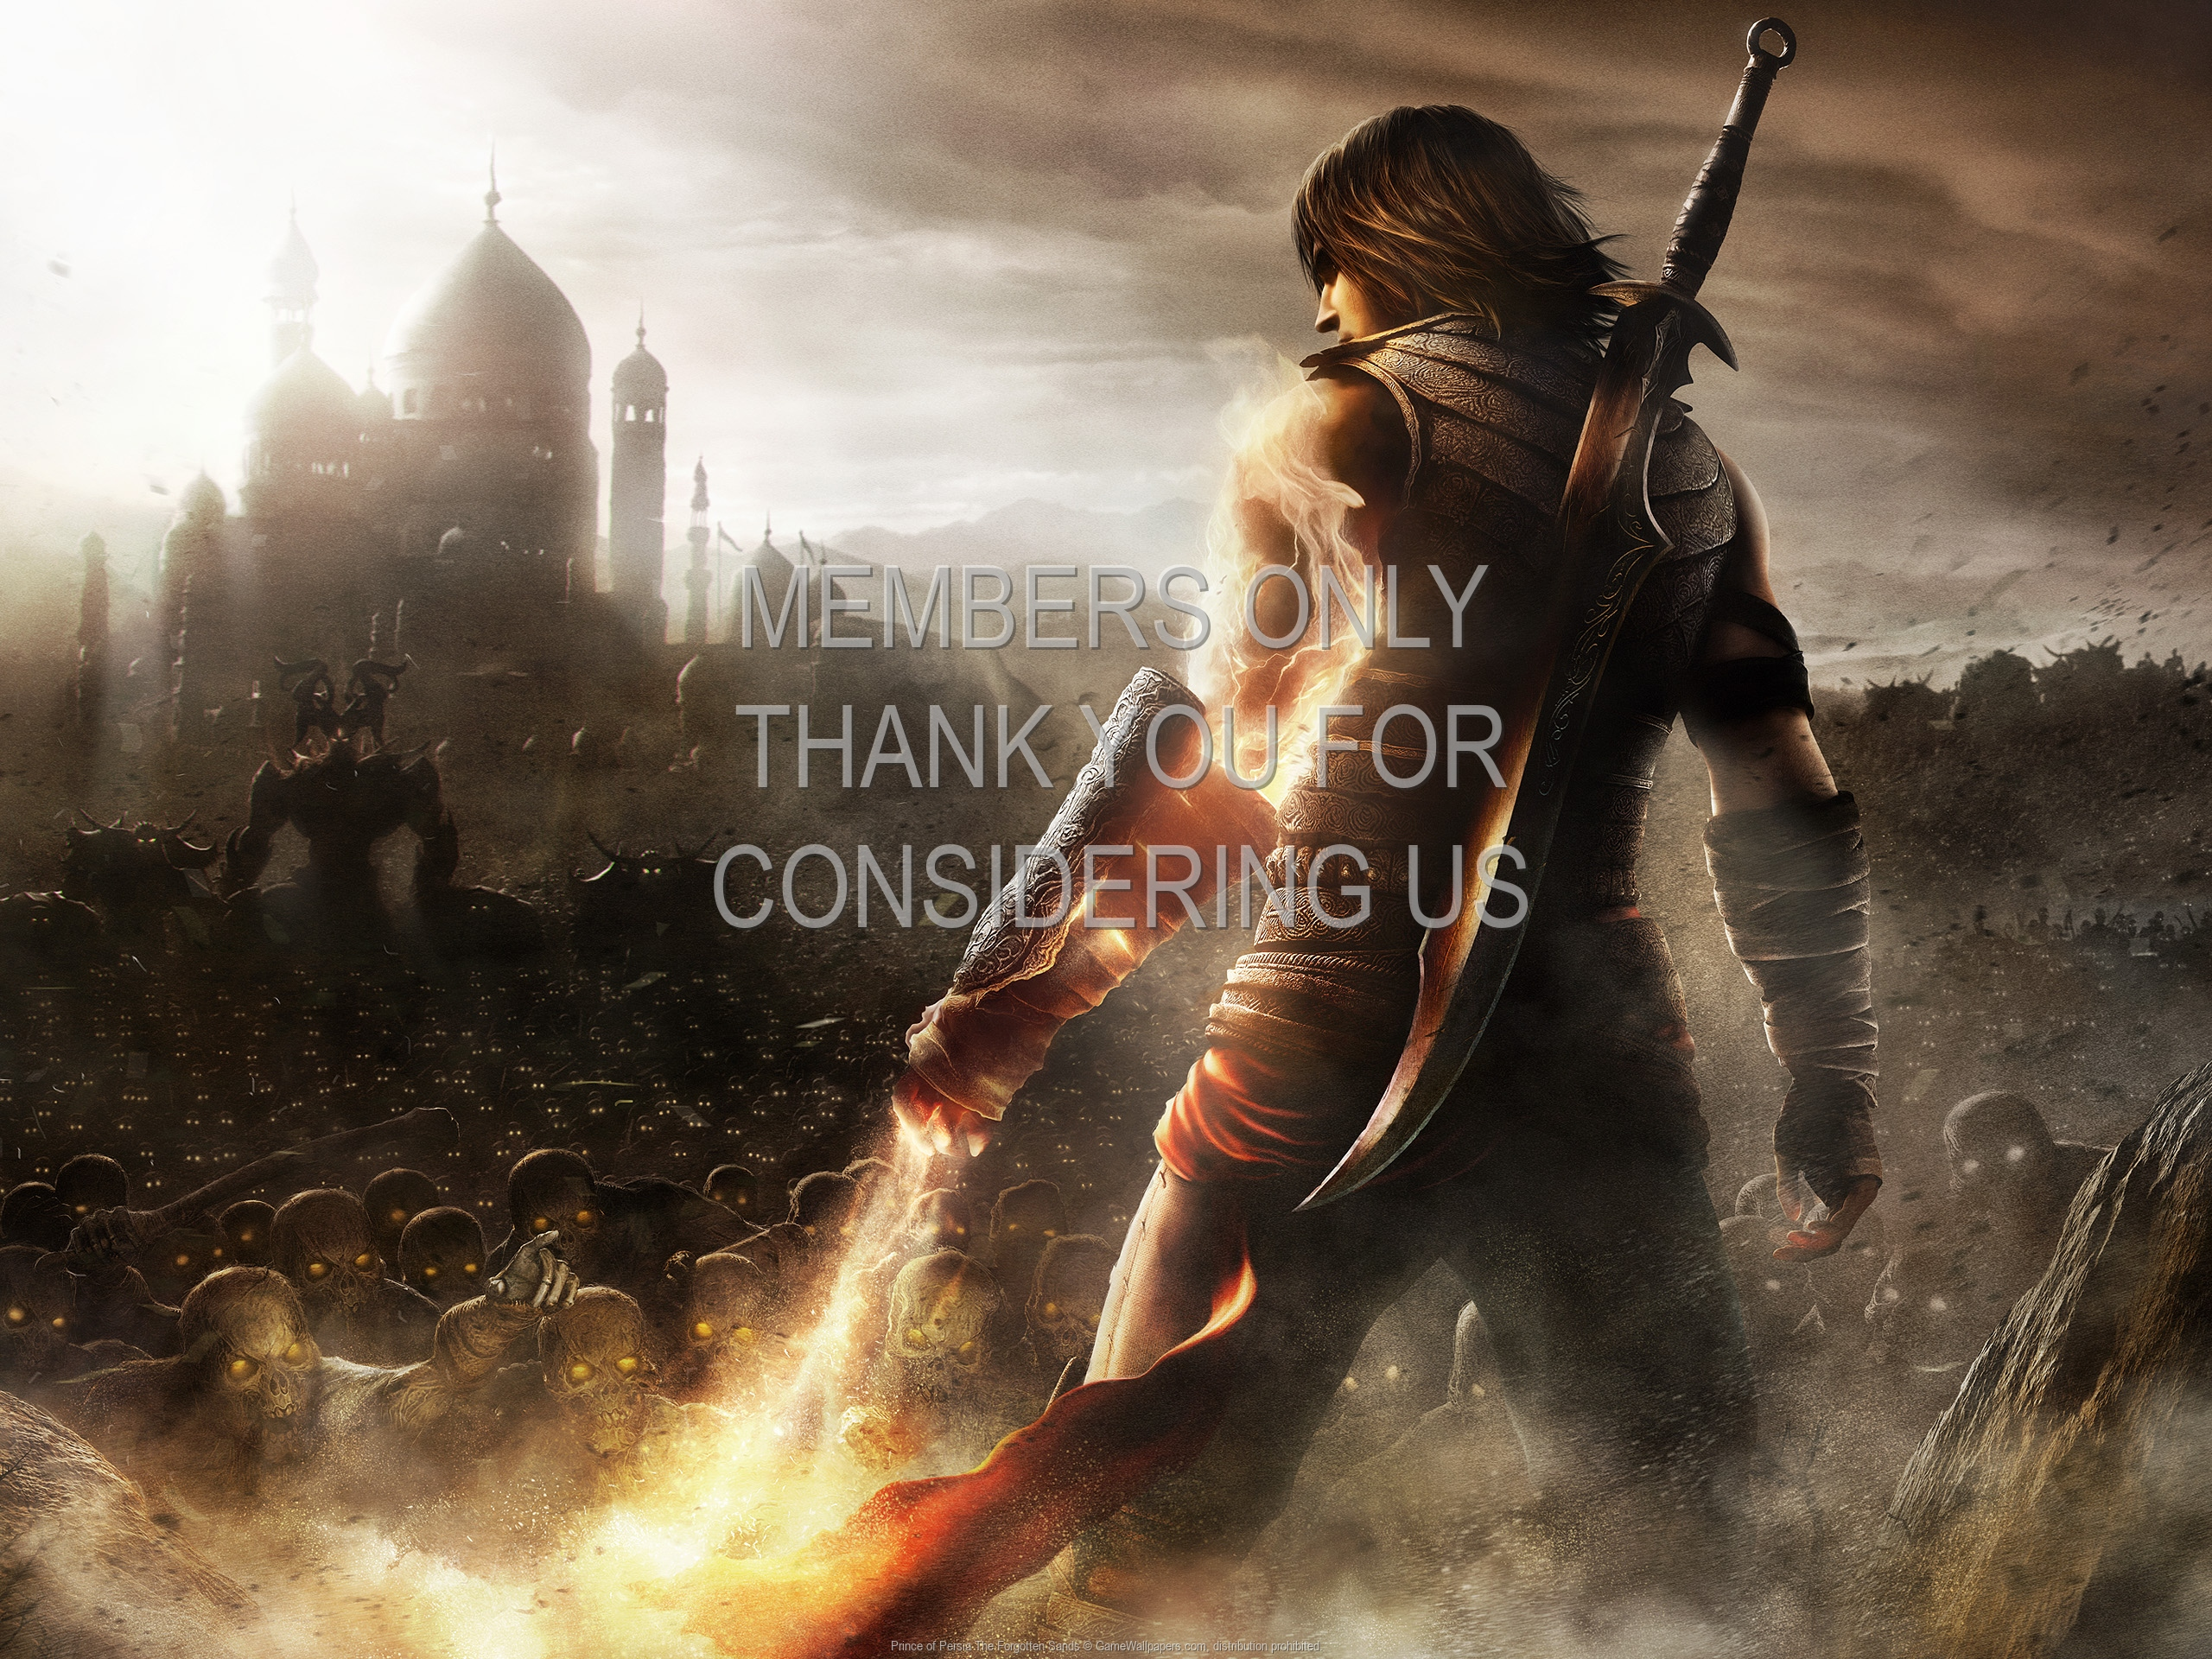 Prince of Persia: The Forgotten Sands 1920x1080 Handy Hintergrundbild 05